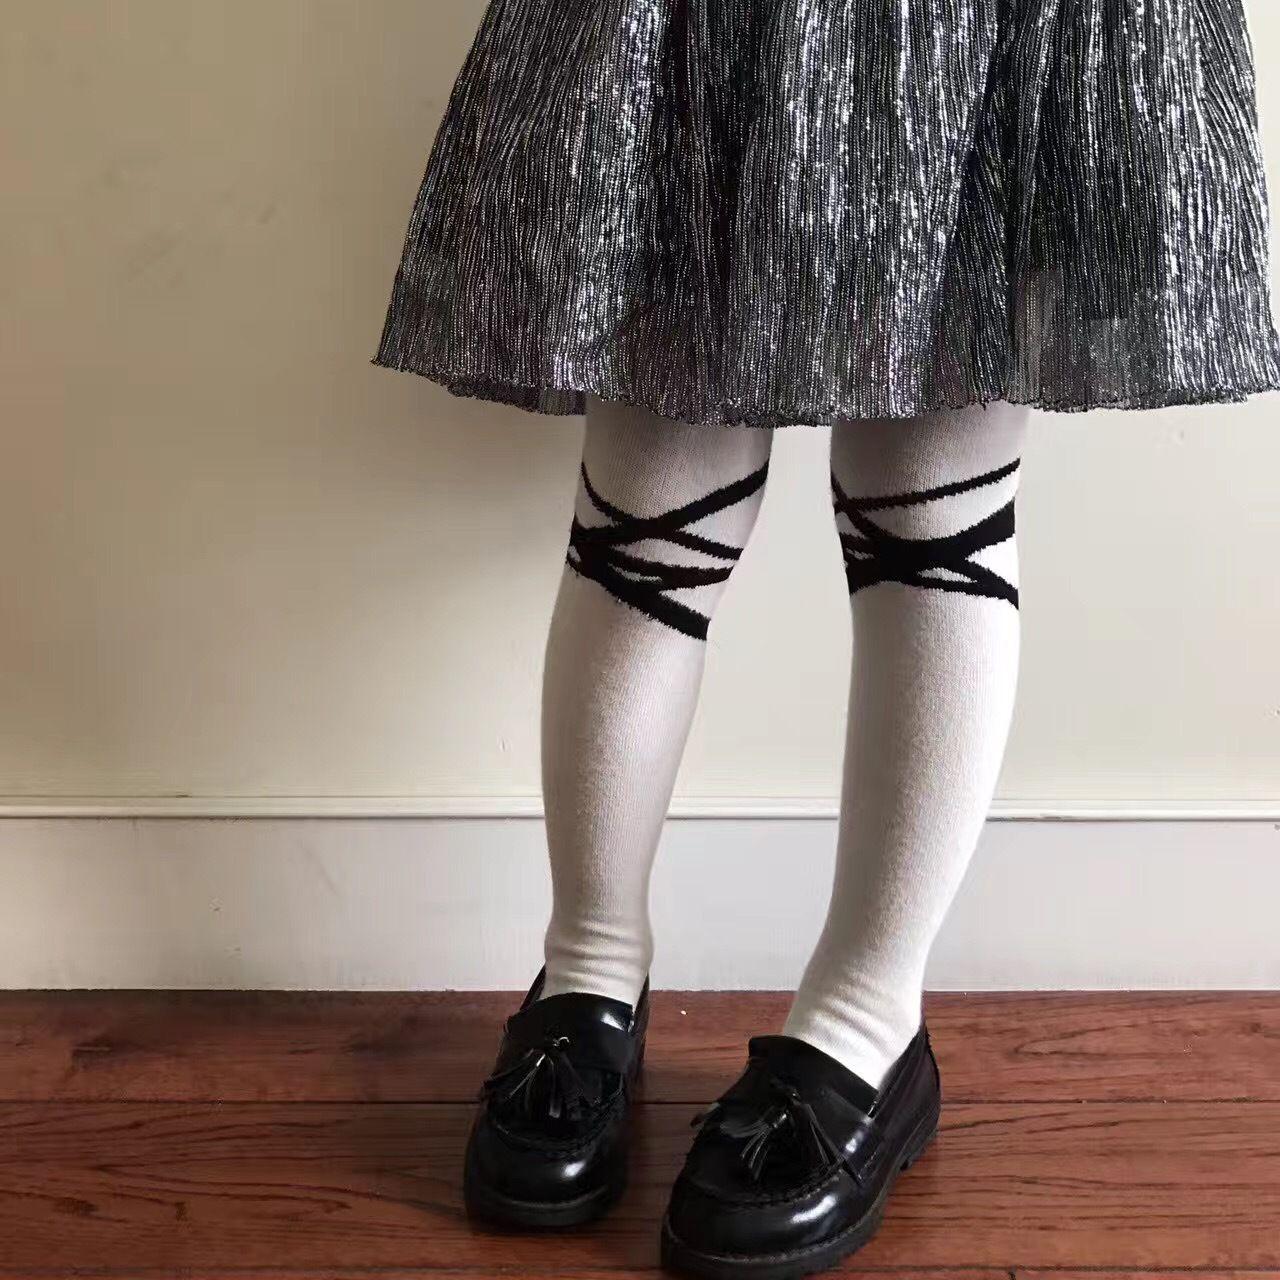 b2951496c23fd8 2018 New Fashion Spring Summer Toddler Kids Child Cotton Knitted Socks Baby  Girl Irregular Abstract Lines Leggings Pants Pantyhose Girls Tights Girl ...